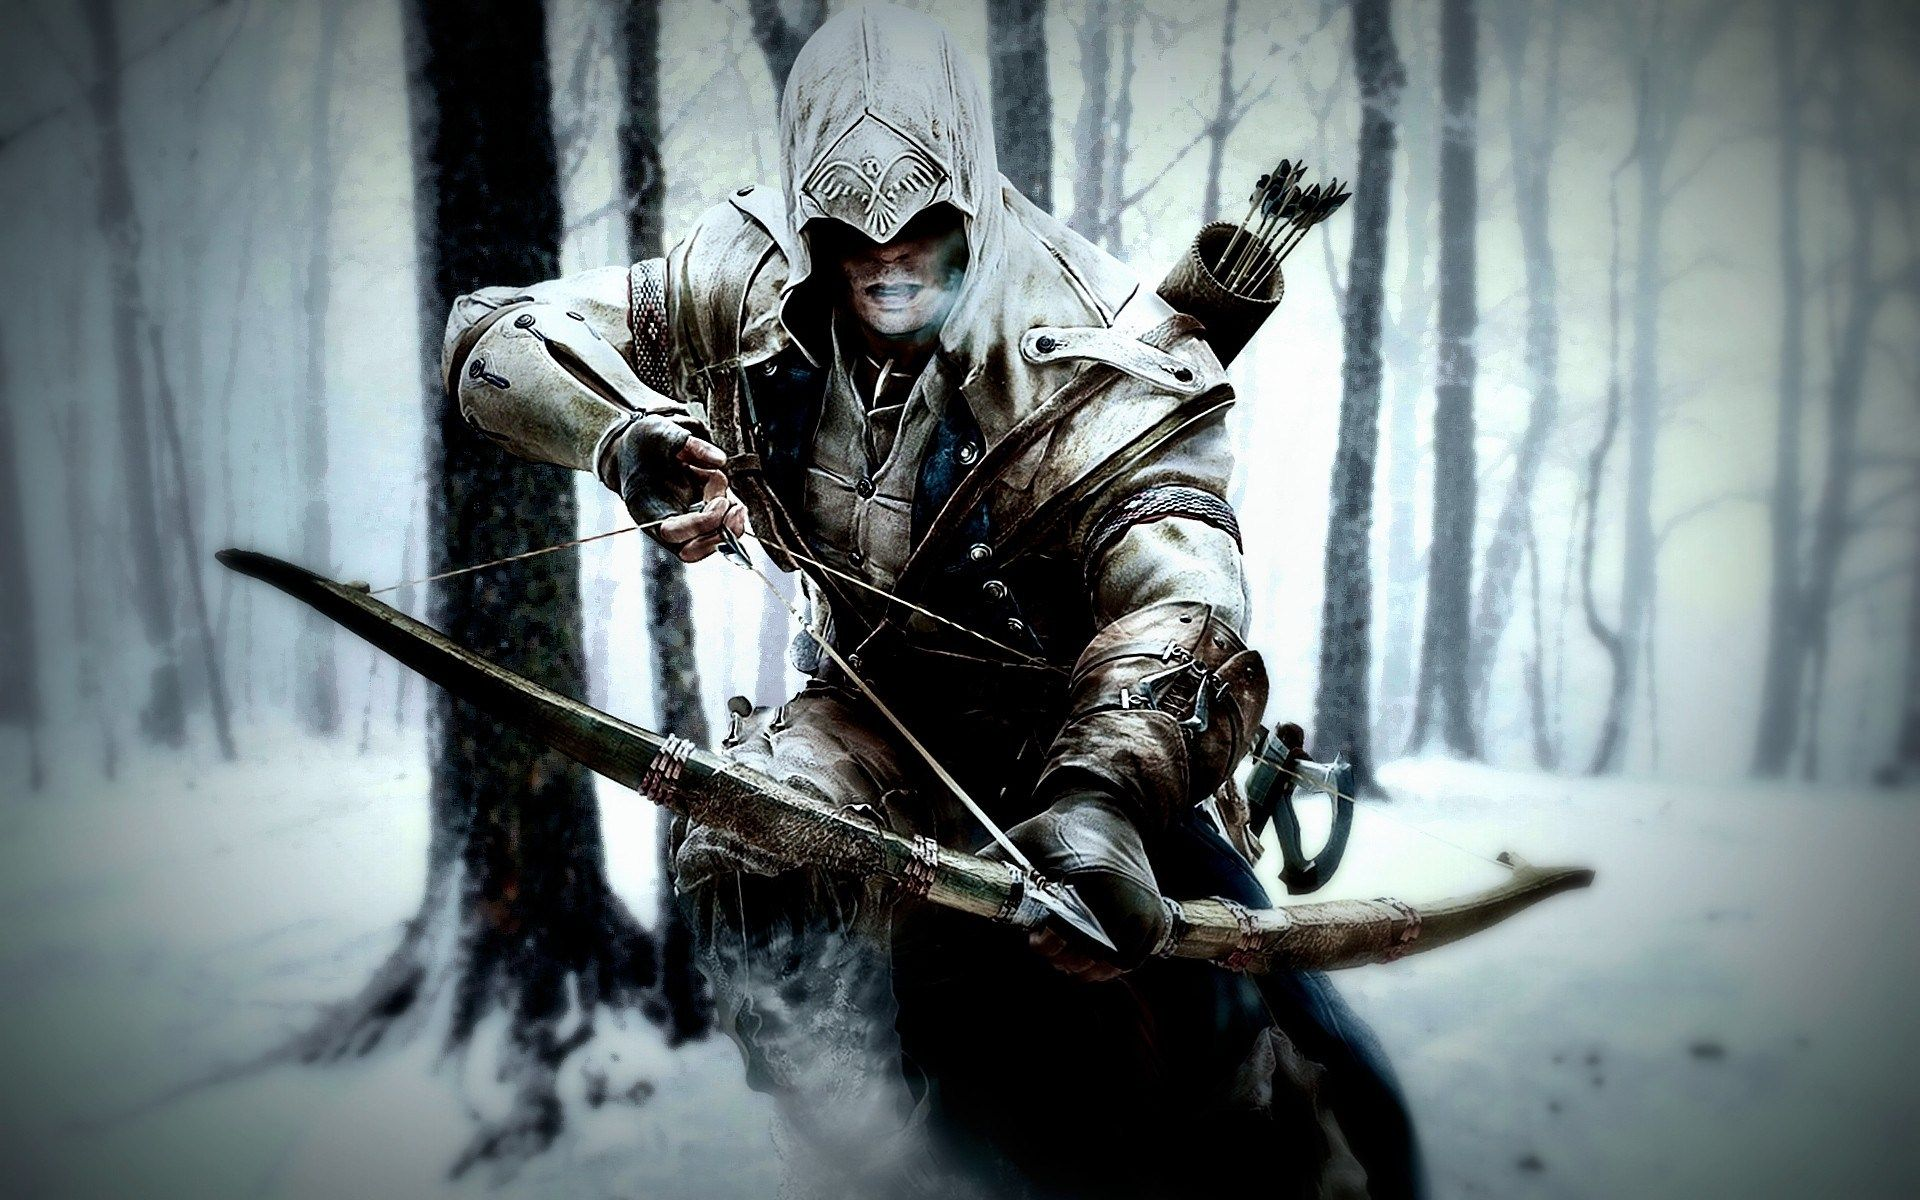 Archery Wallpaper HD7 Assassins creed